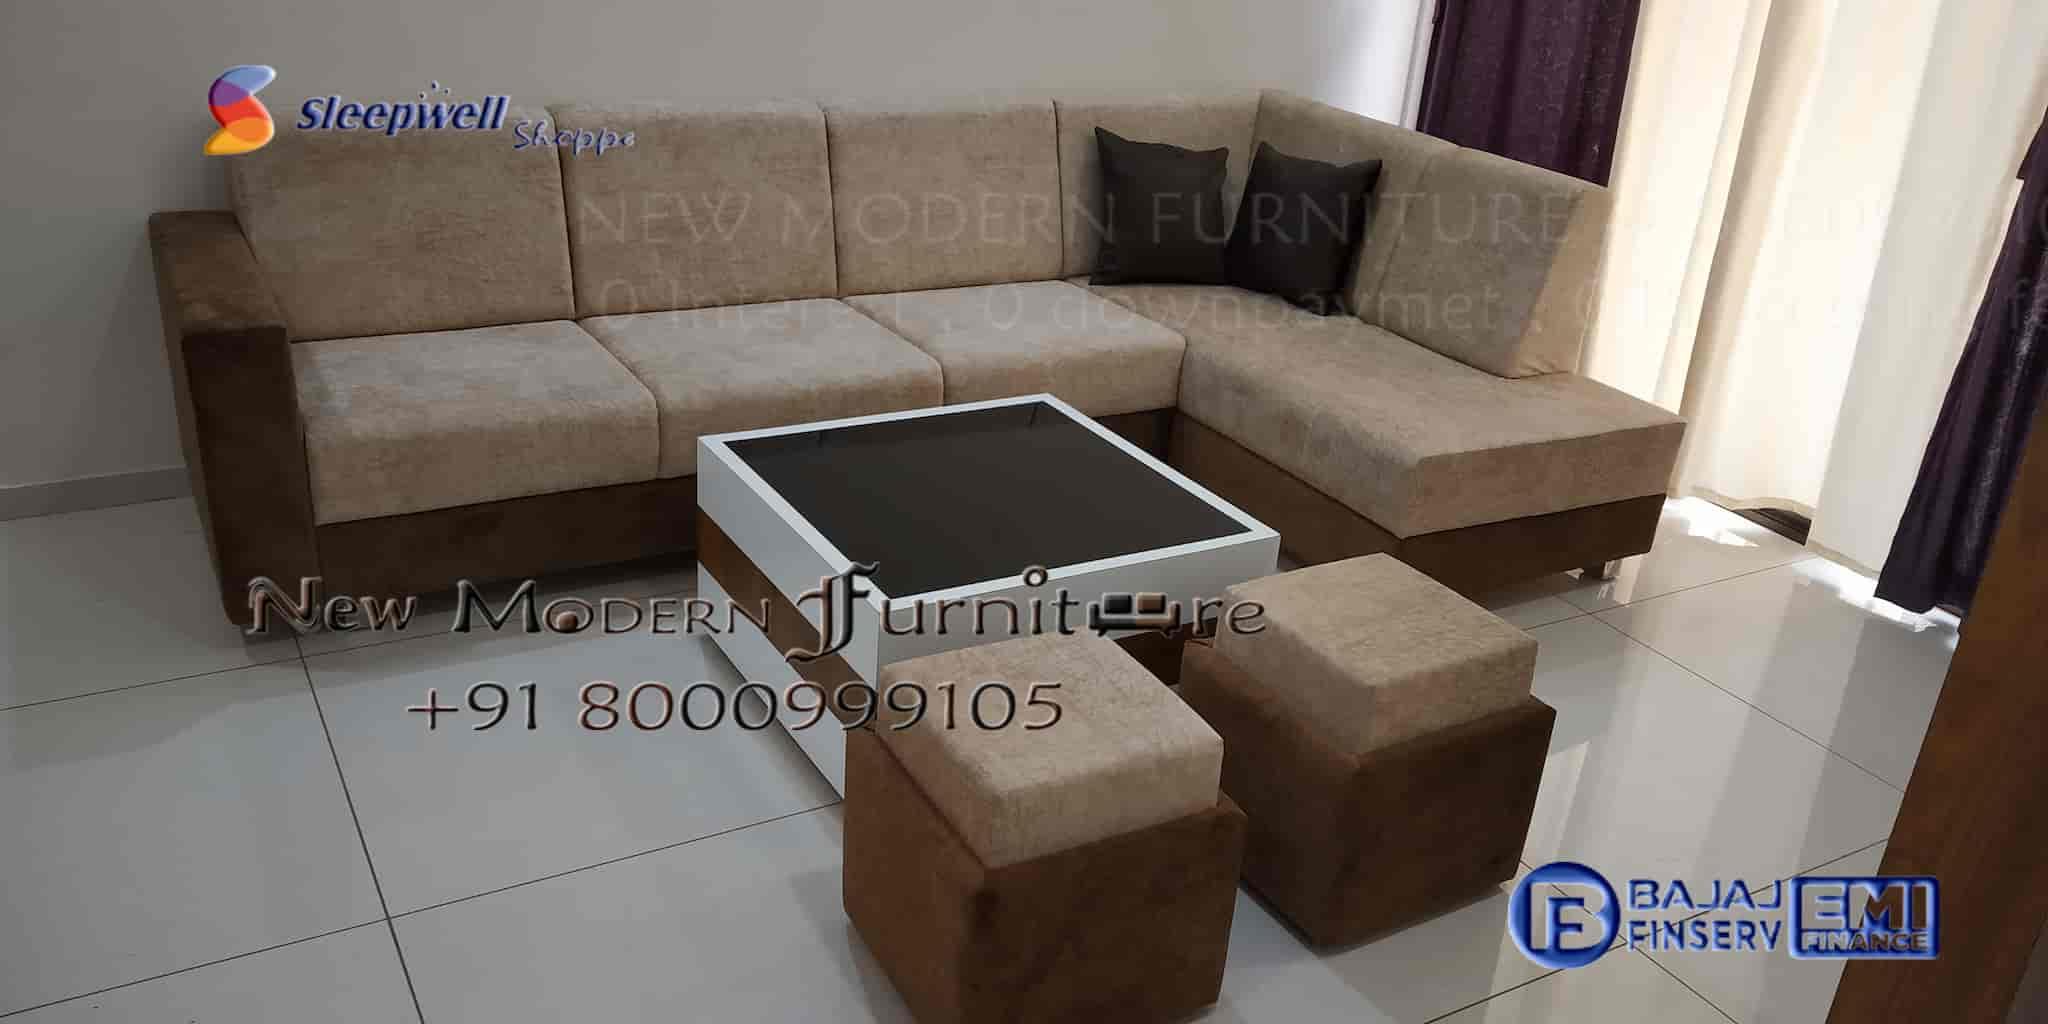 New mordern furniture waghodia road vadodara